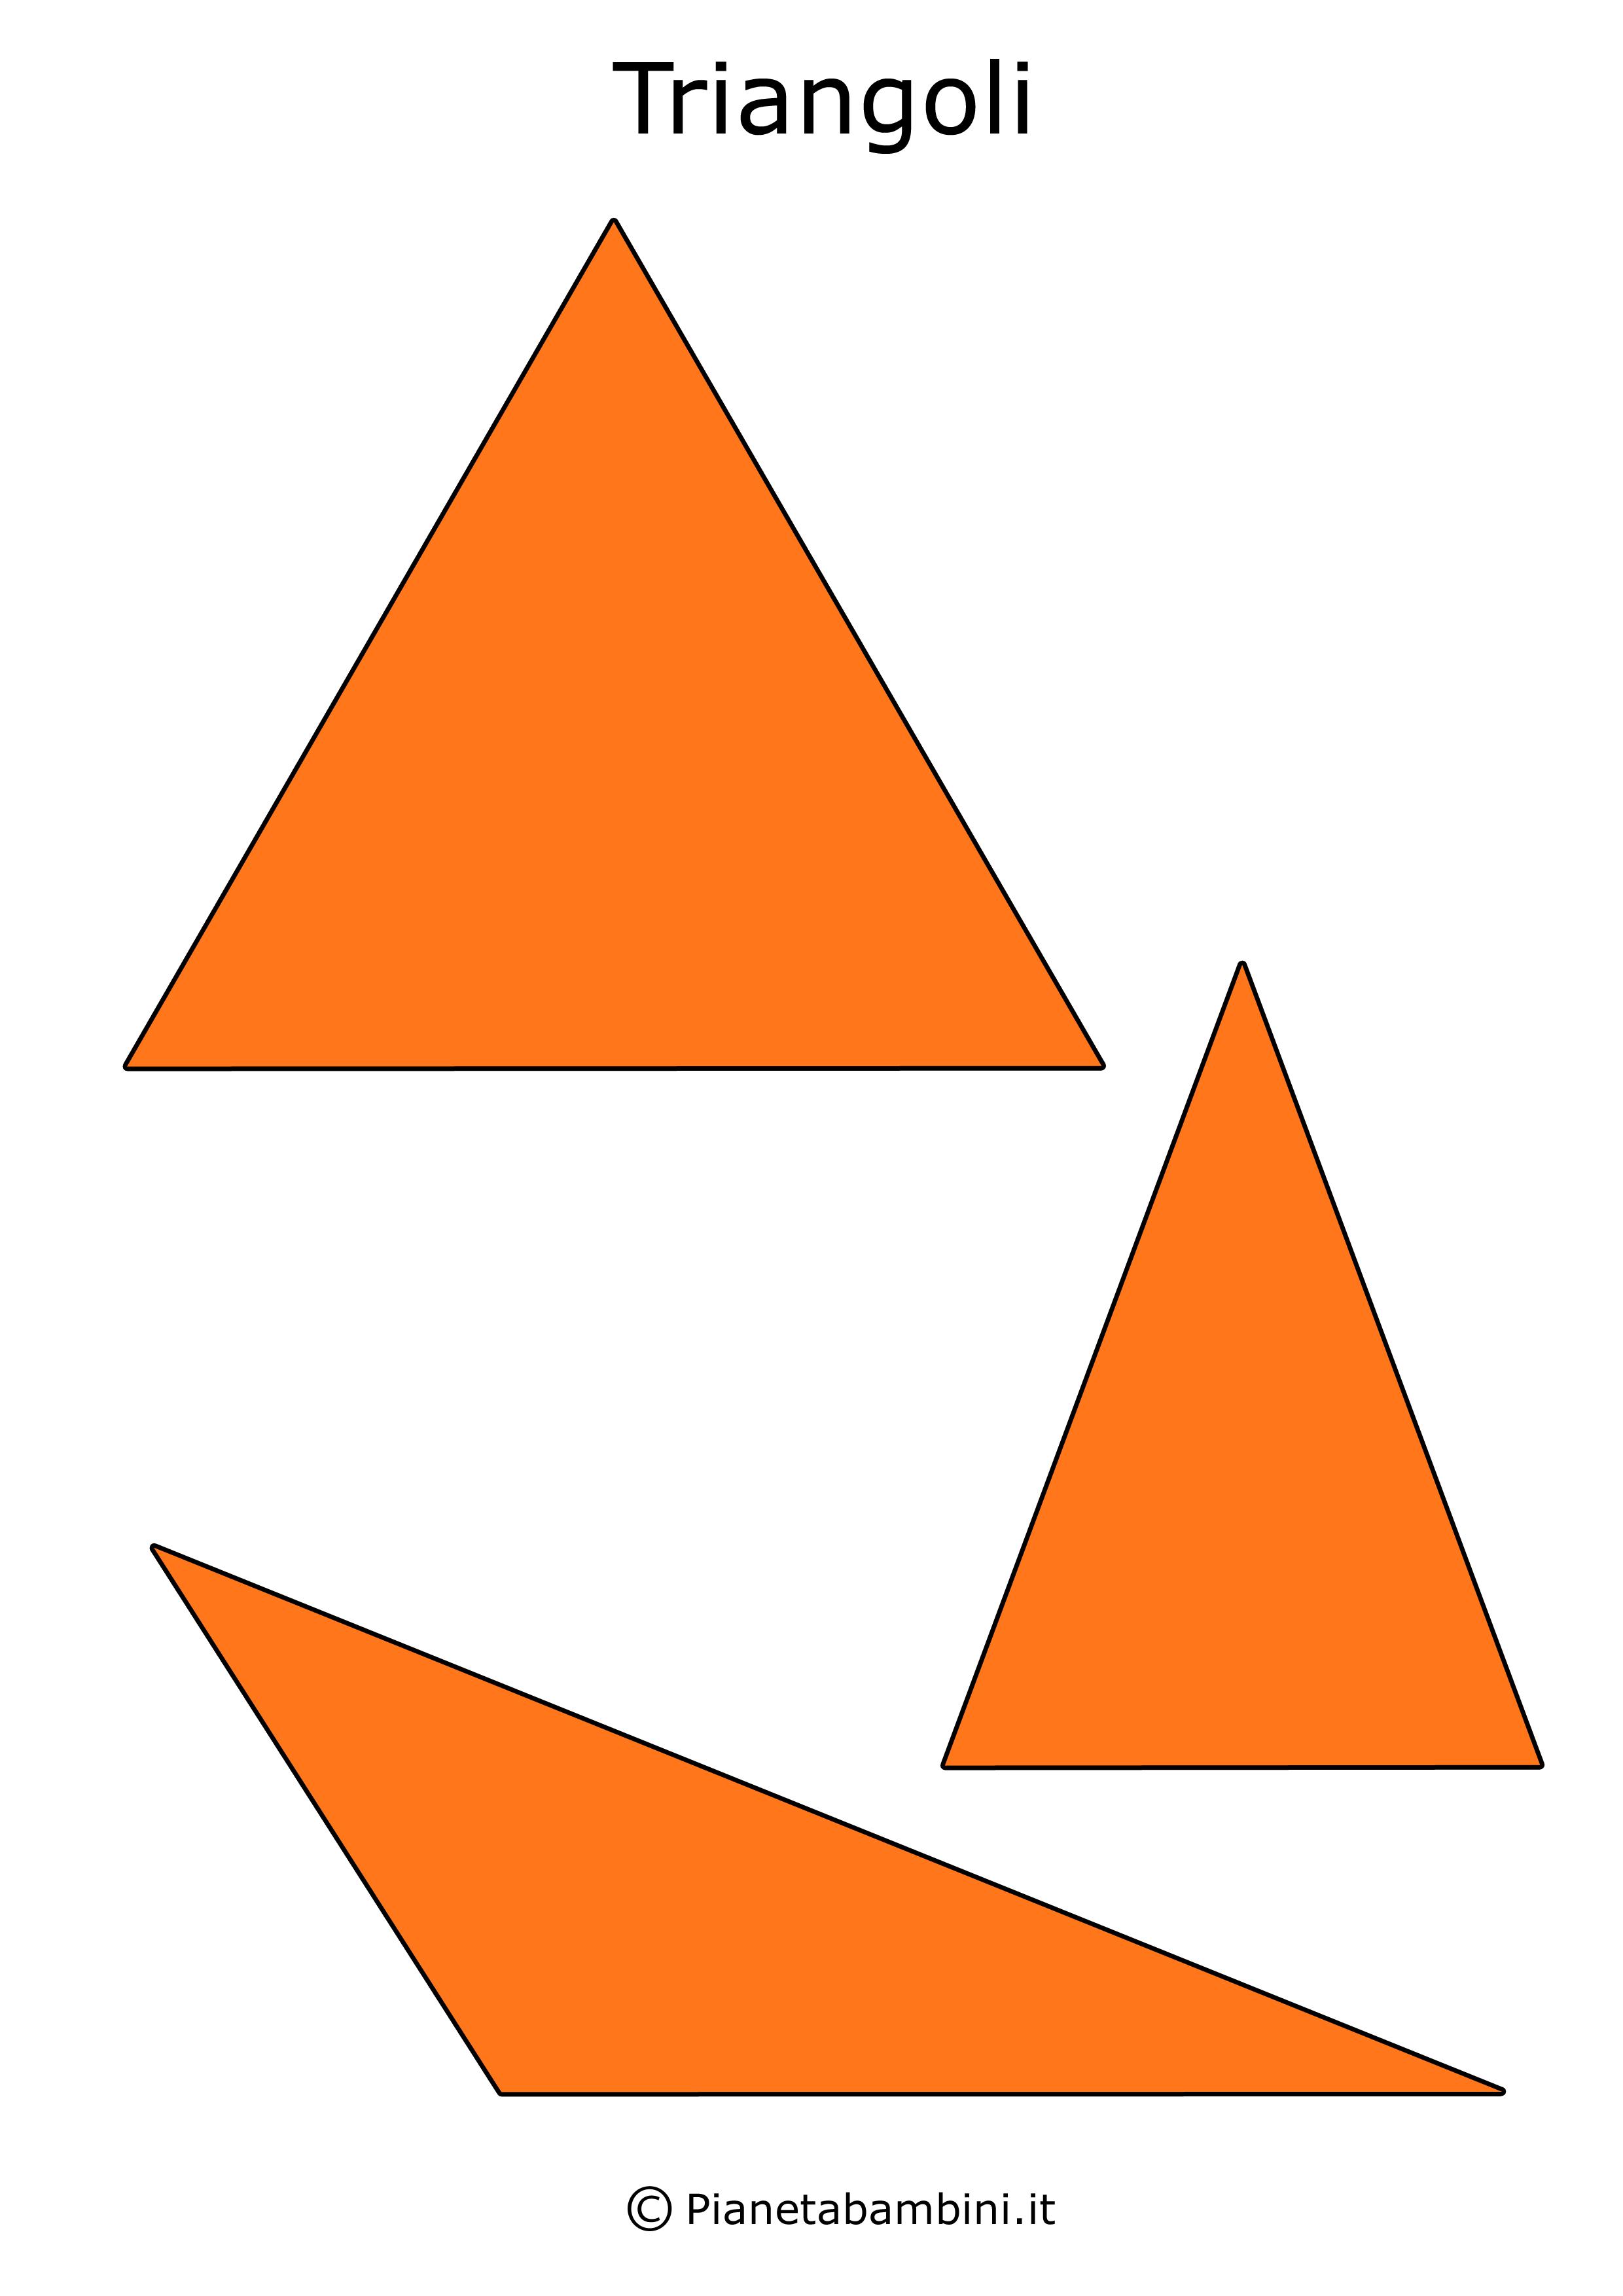 Triangoli-Semplici_1